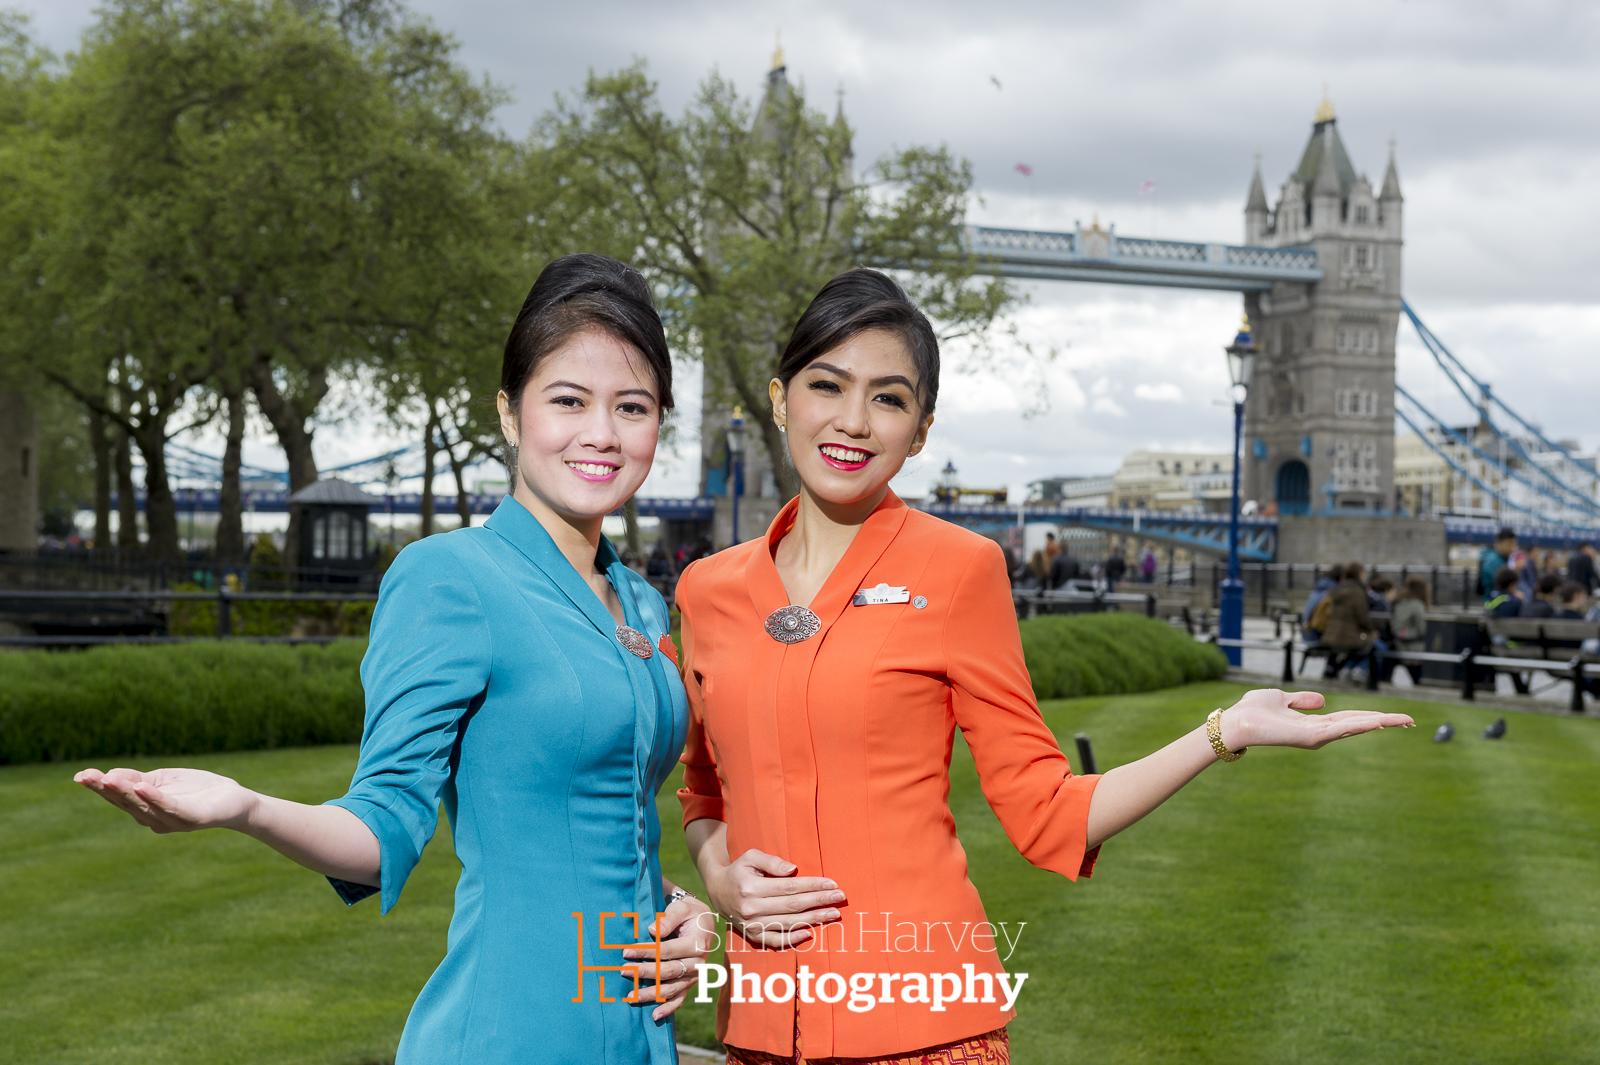 2 Garuda Indonesia Hostess' exploring Tower Bridge and other London landmarks